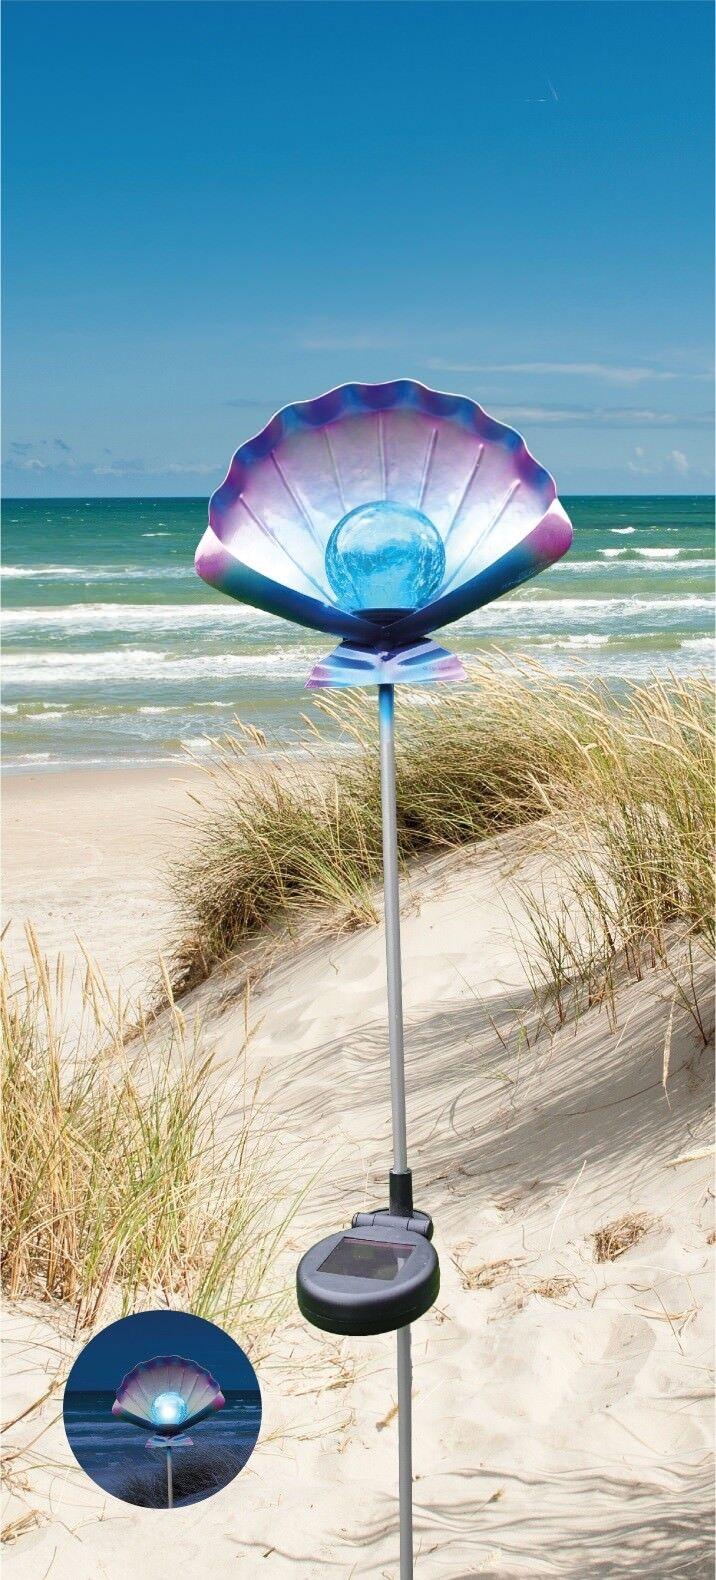 Solar- Gartenstecker Muschel LED mit Erdspiess Leuchten Garten Beleuchtung